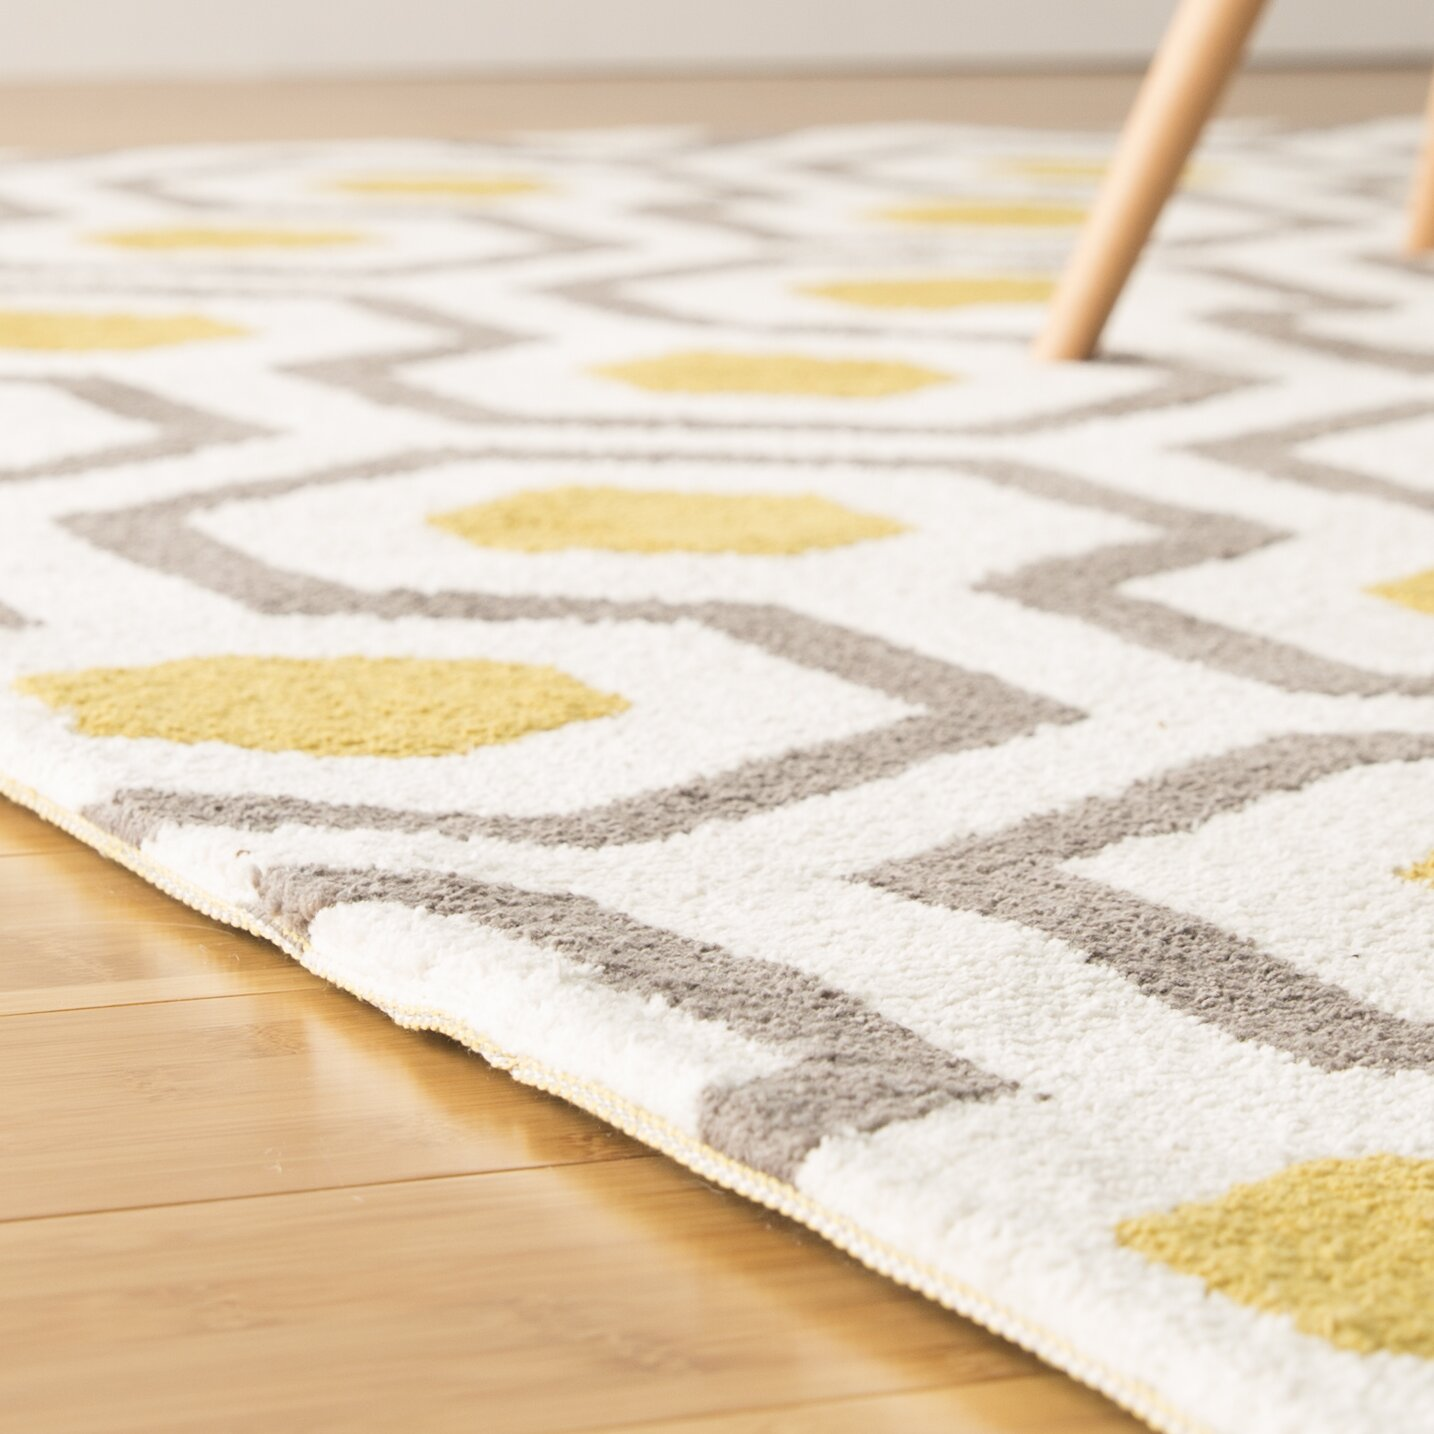 langley street noam hand tufted beige gray yellow area rug reviews wayfair. Black Bedroom Furniture Sets. Home Design Ideas